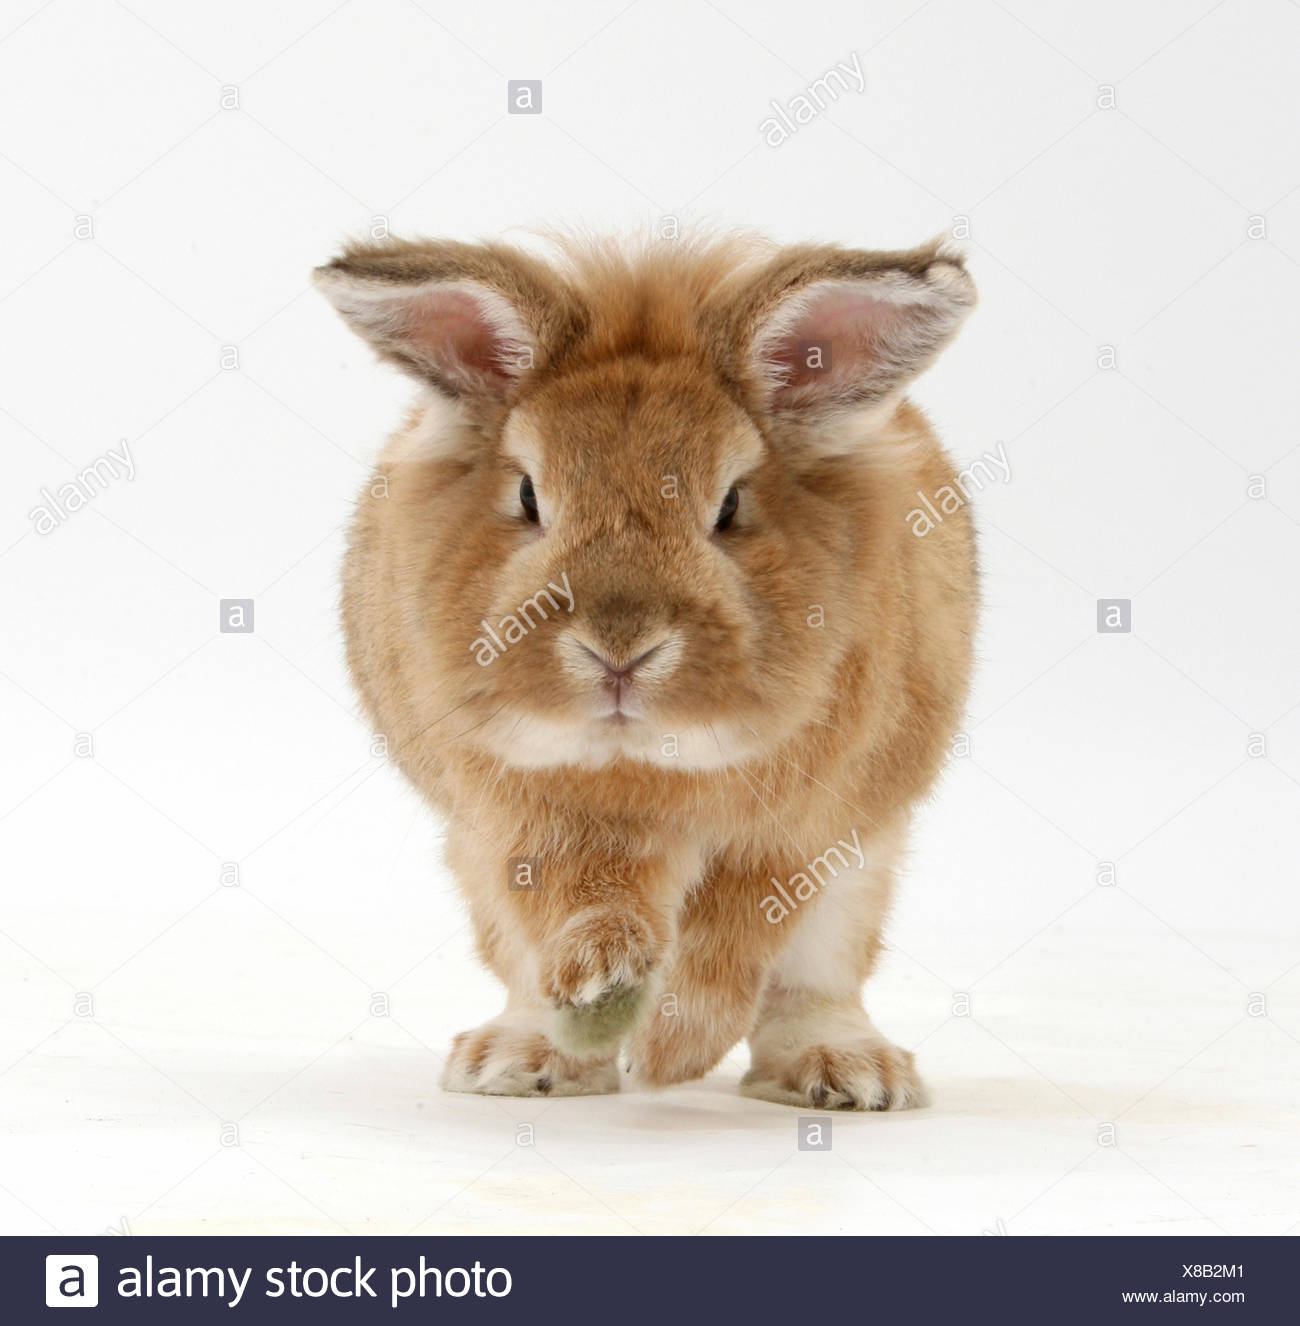 Lionhead x Lop rabbit, Tedson, running, against white background Stock Photo